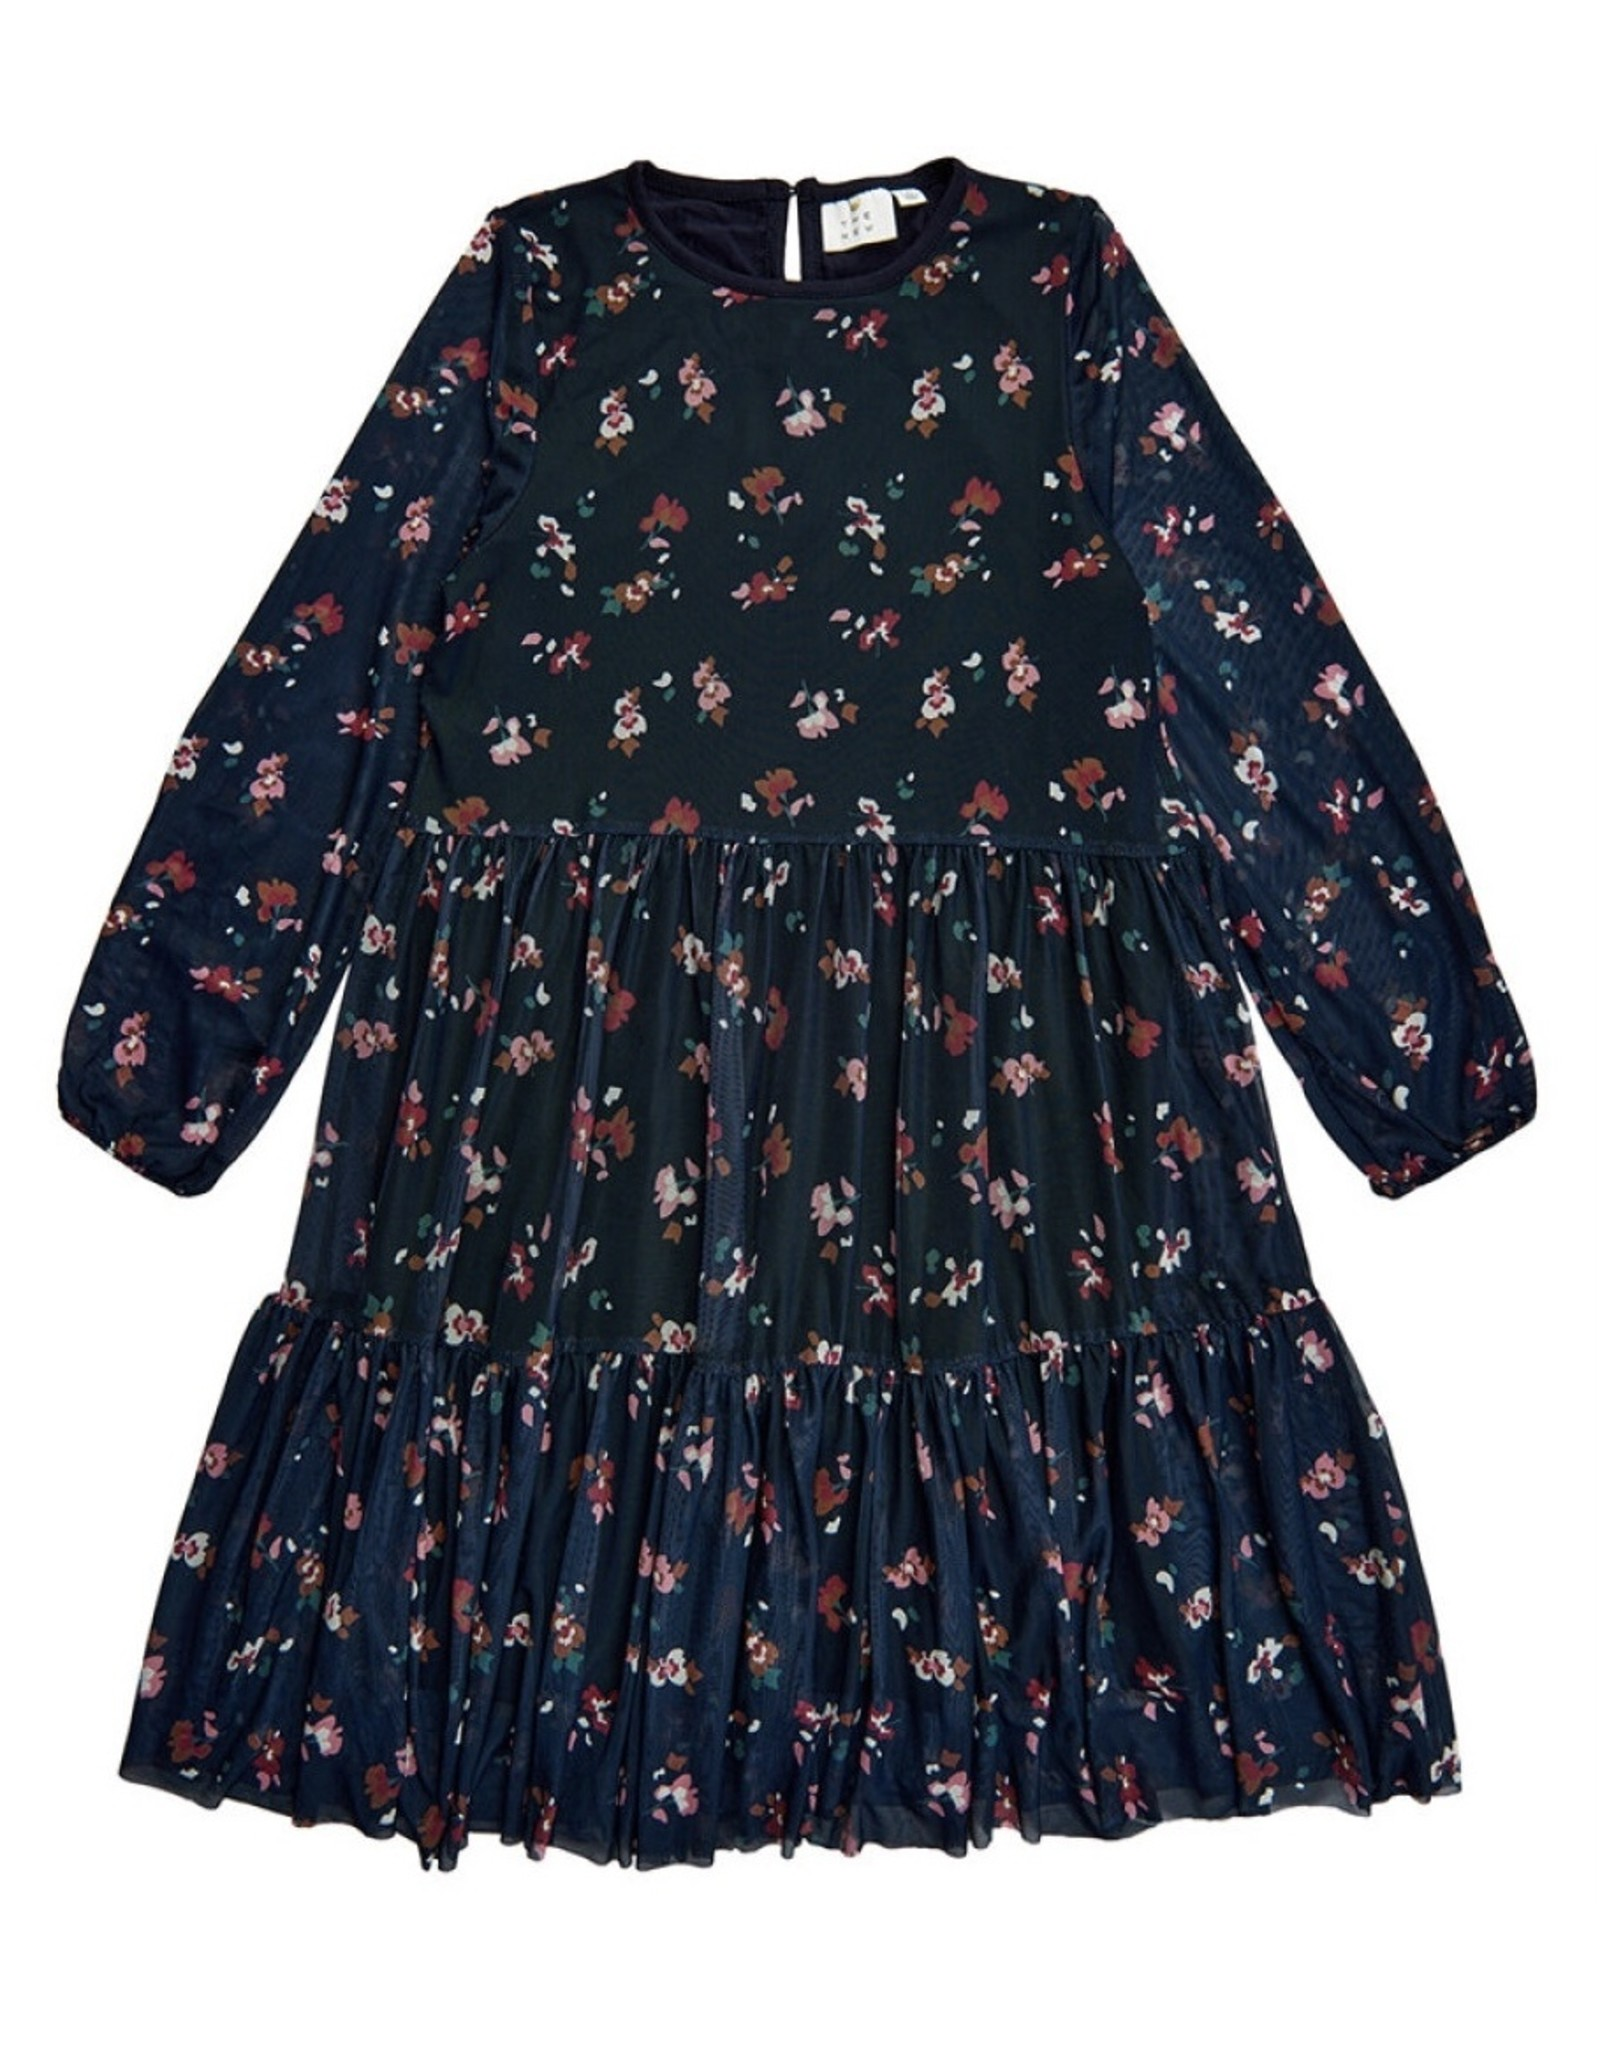 The New Anna Vivienne Dress